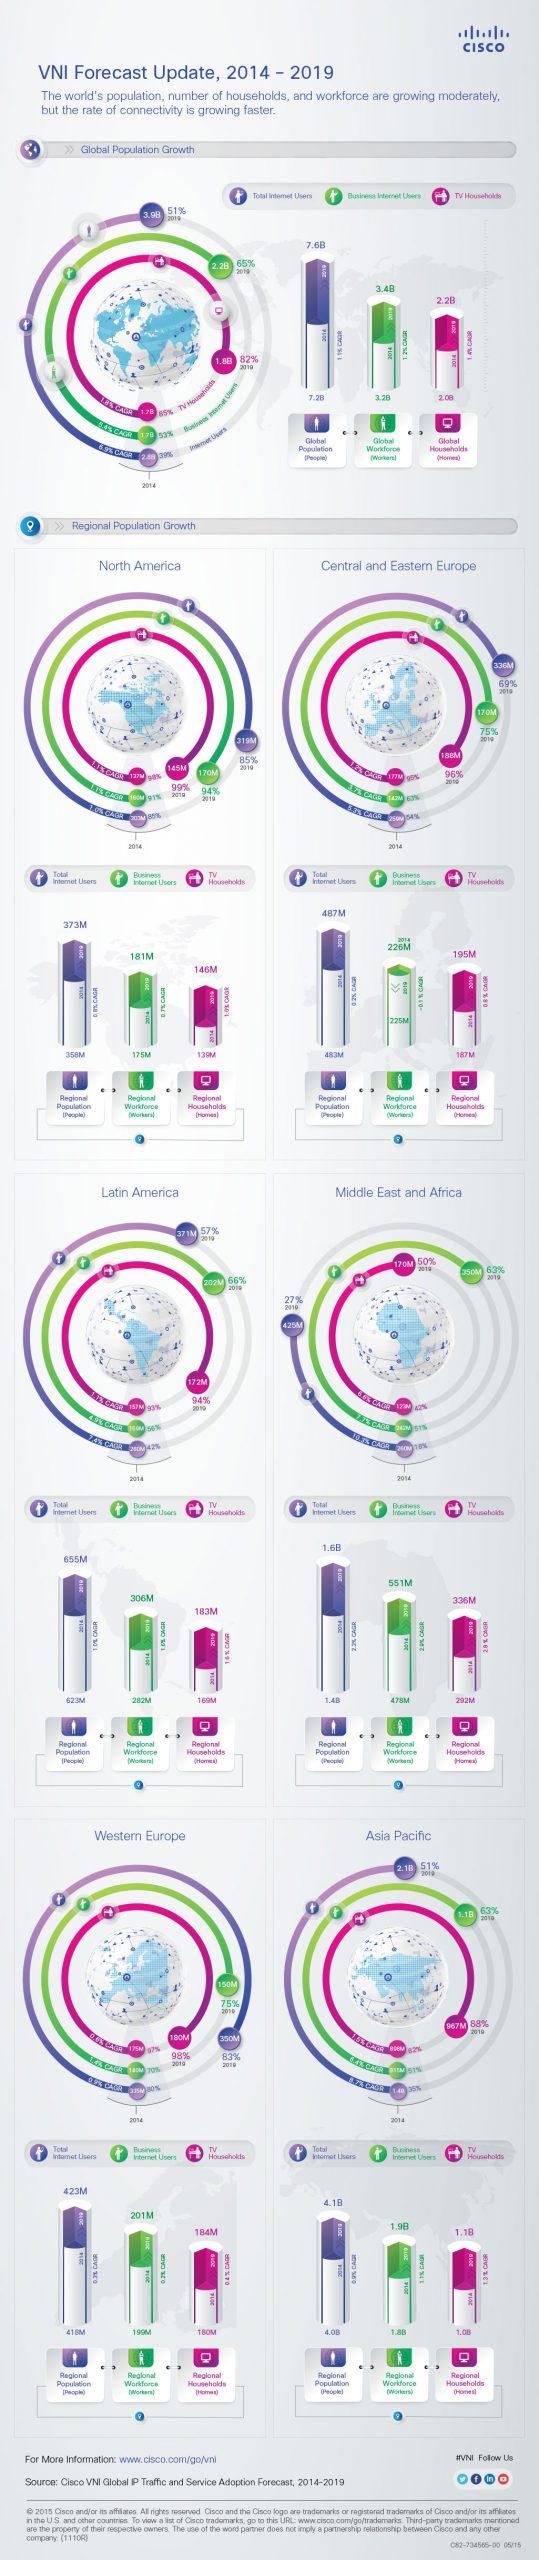 vni-forecast-infographic